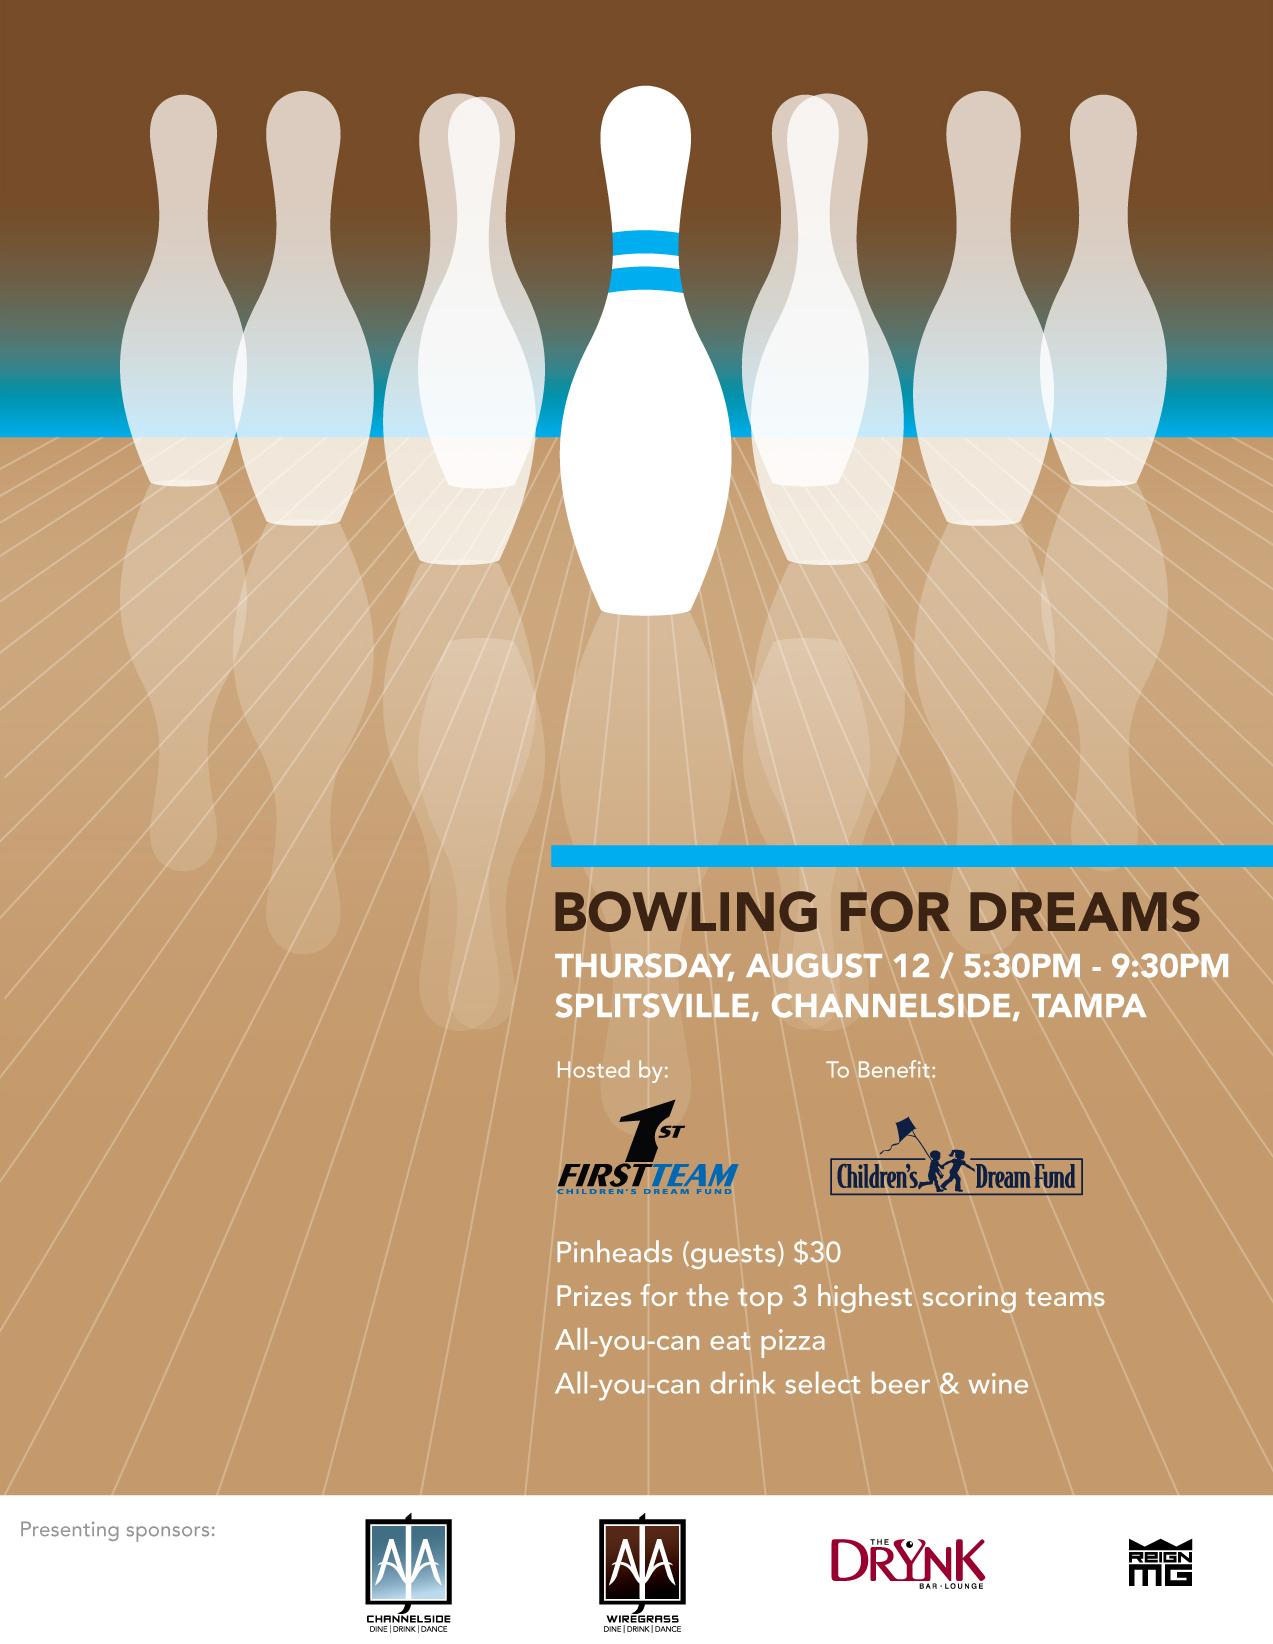 df bowling sponsor